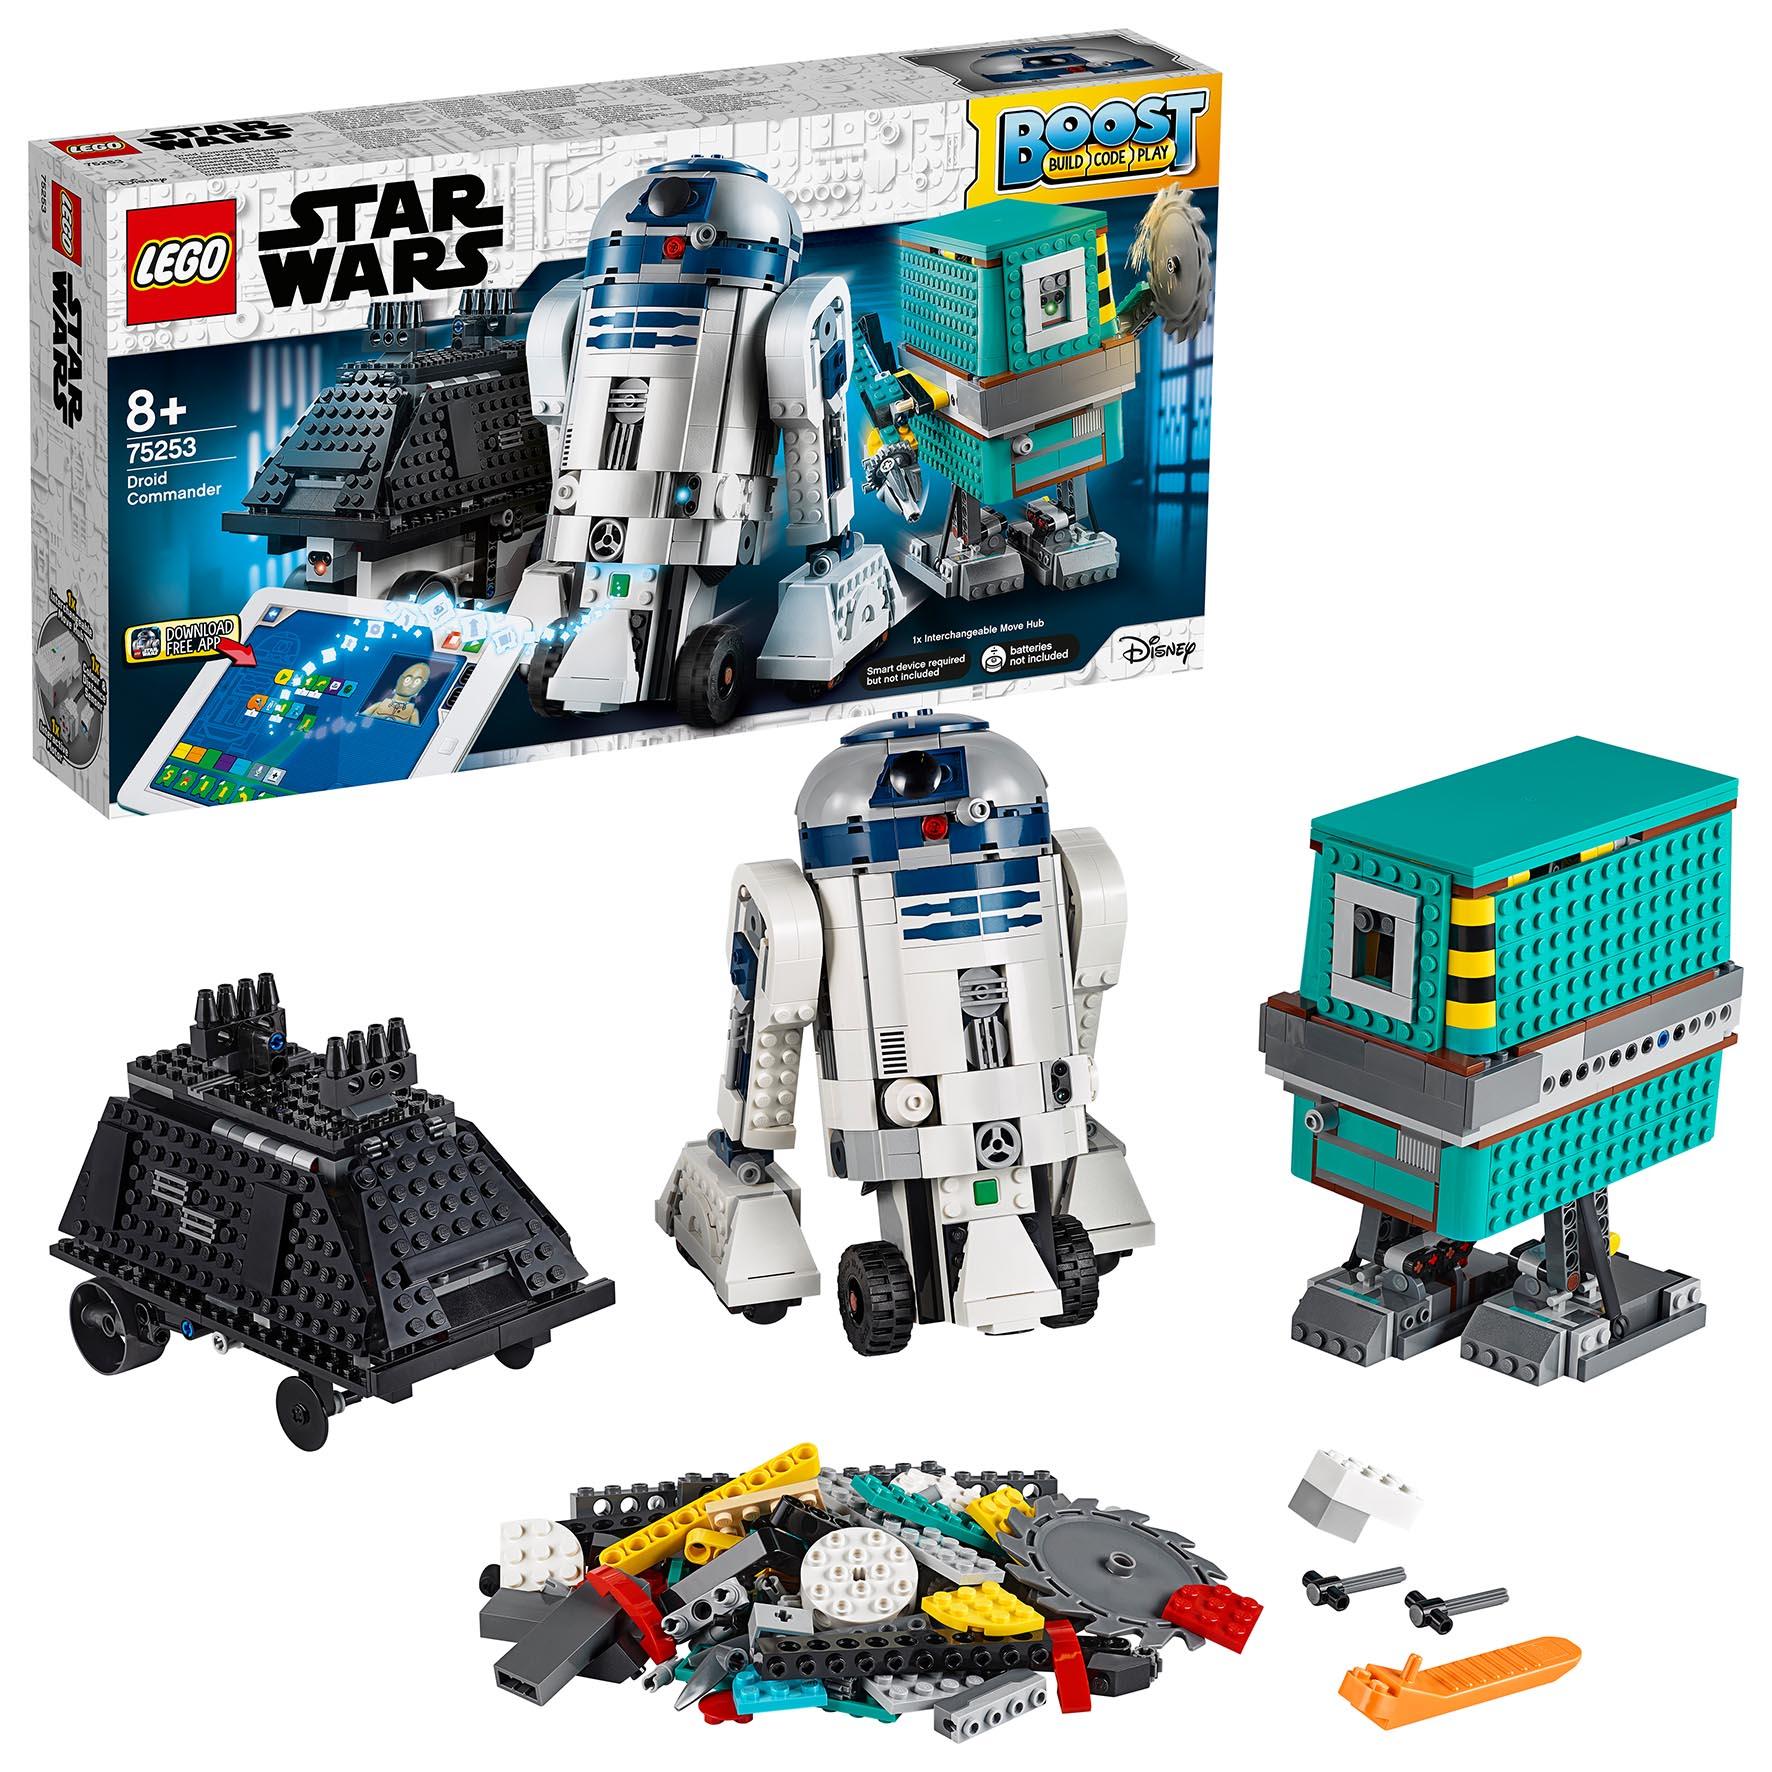 R2D2 DROIDE DI STAR WARS LEGO